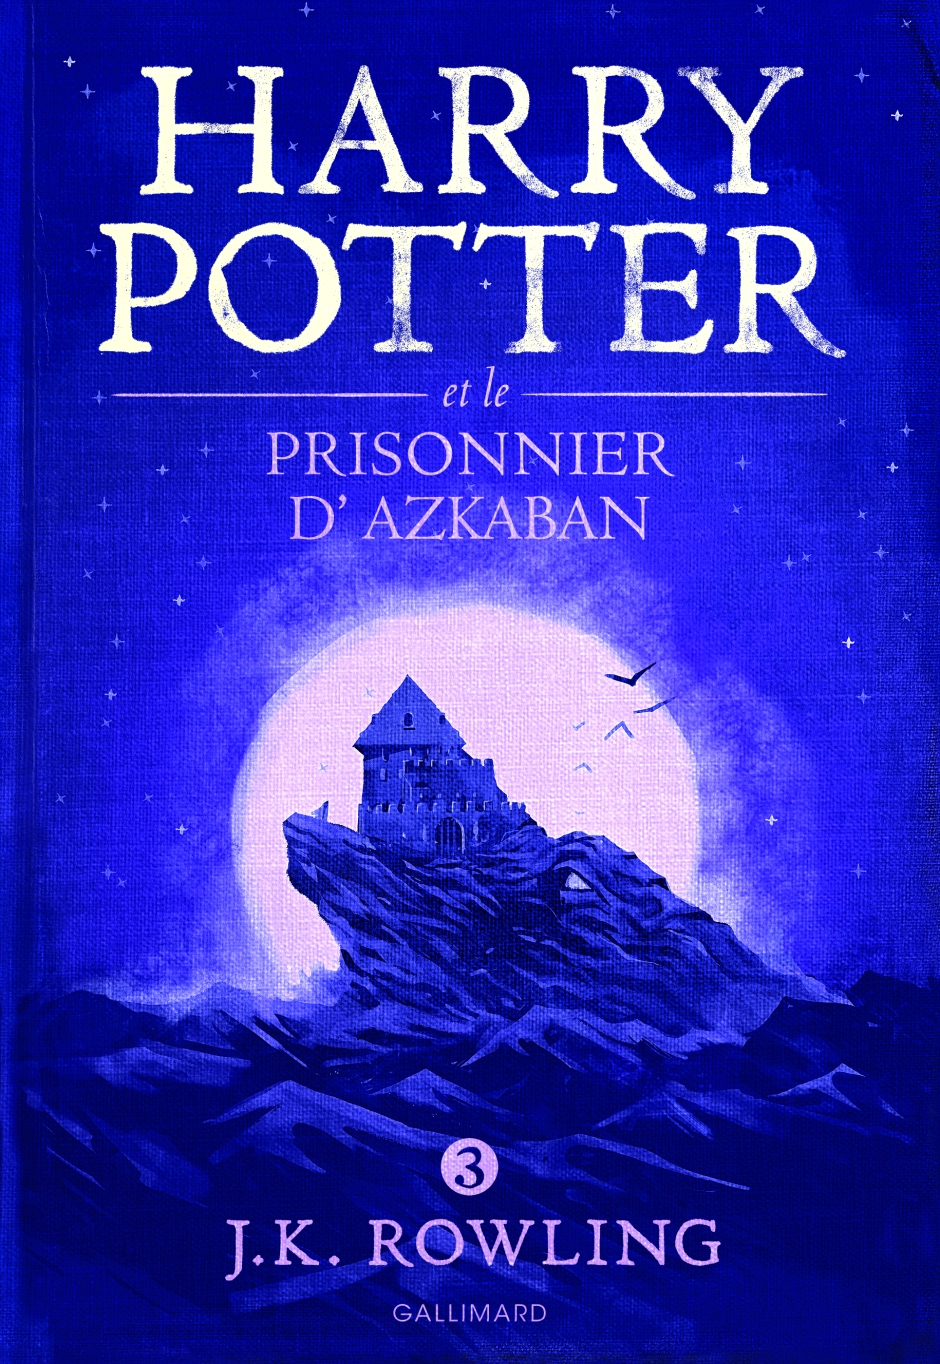 GF_HP3_prisonnier_azkaban_A62454.indd